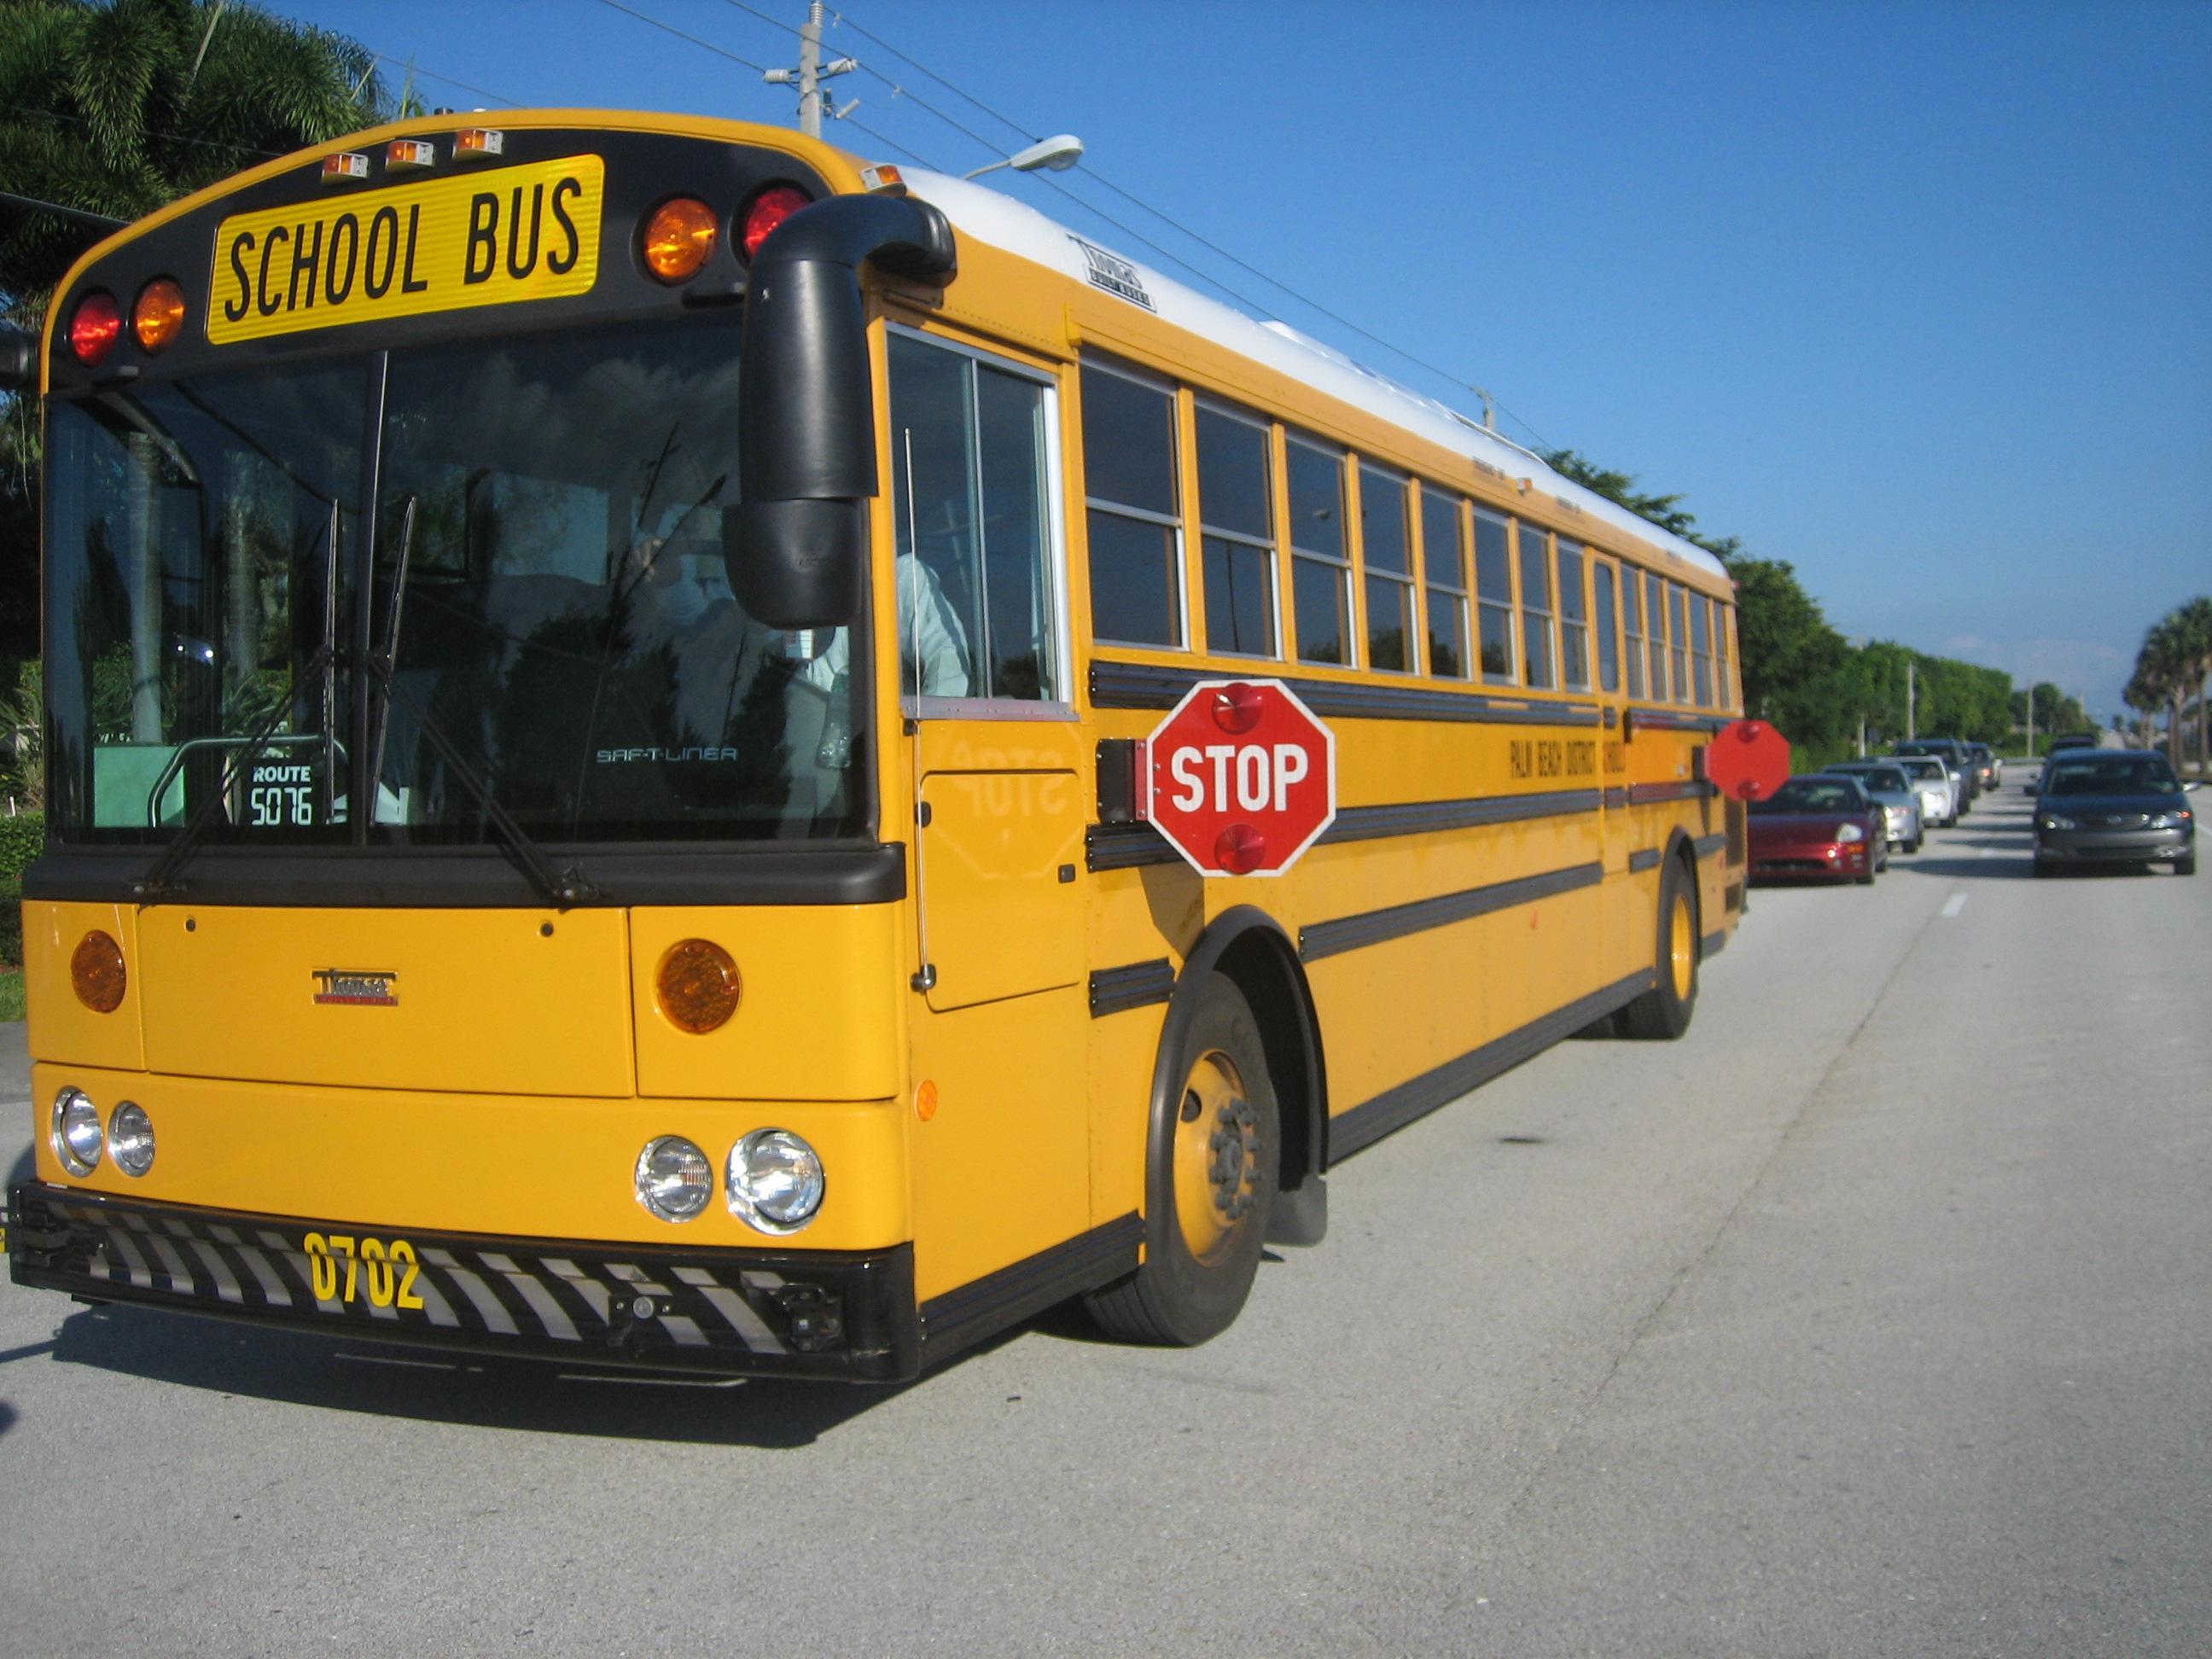 FileThomas School Bus Busjpg   Wikipedia the encyclopedia 2592x1944